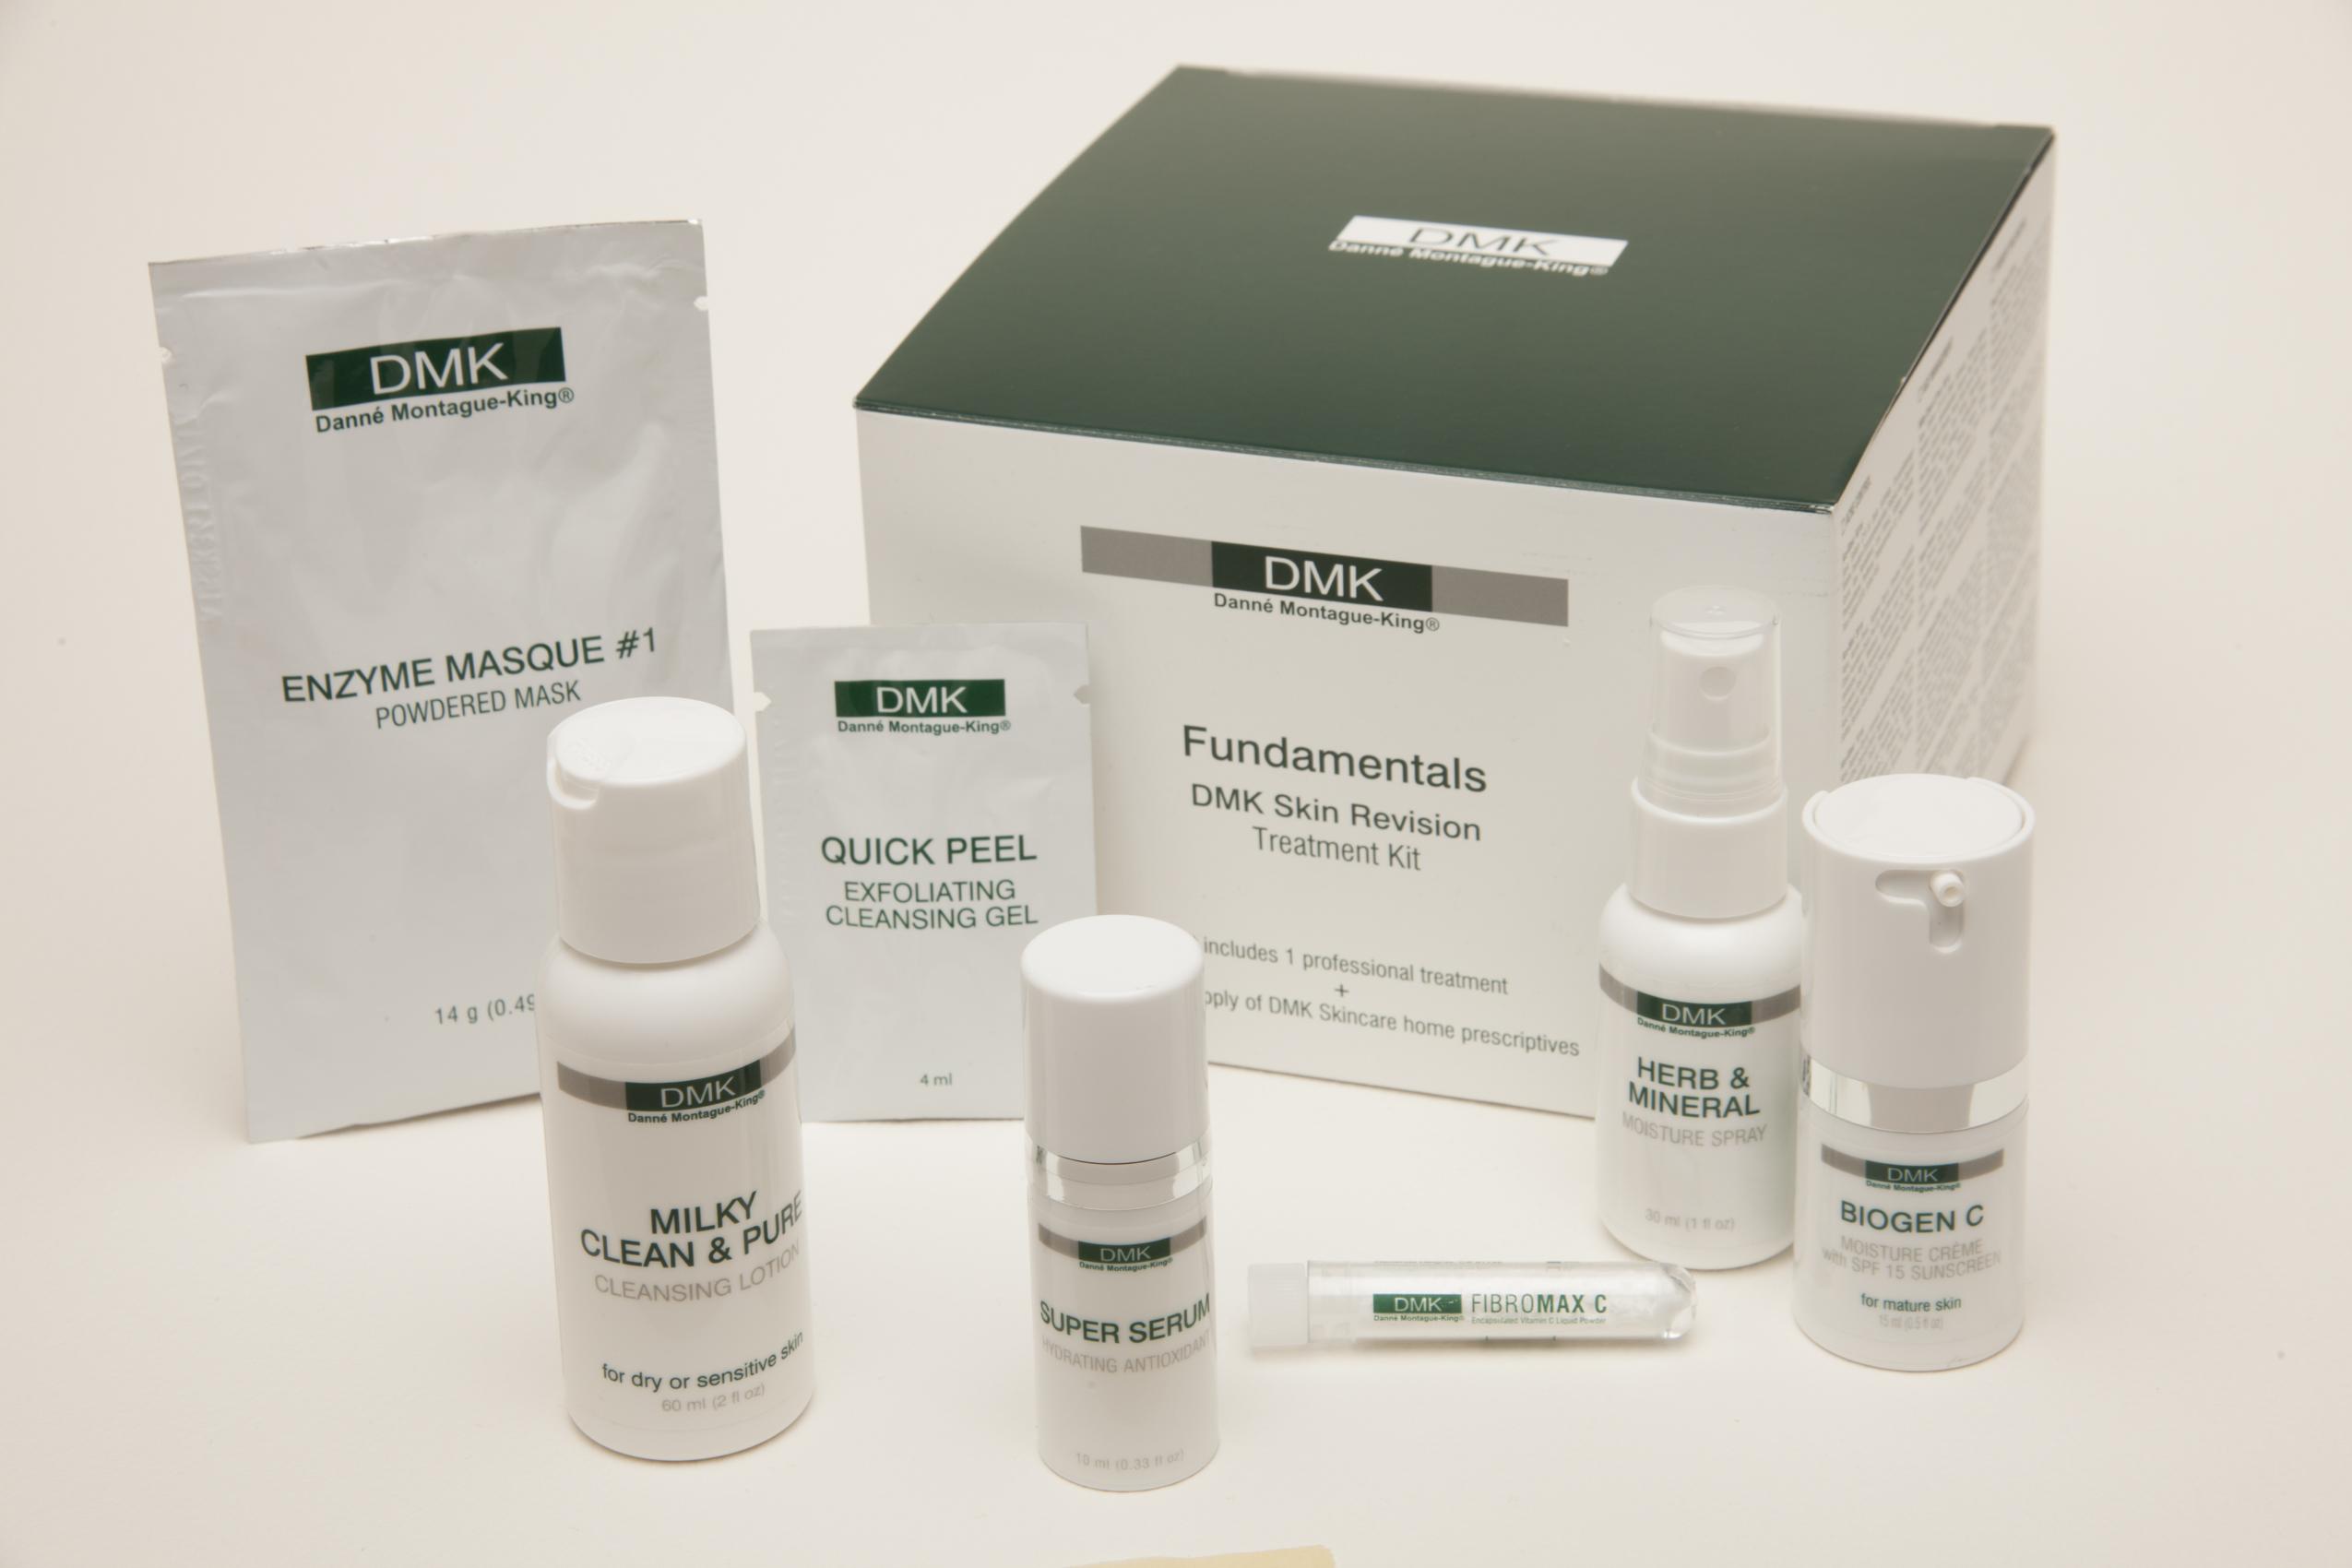 DMK to introduce new product range - Aesthetics